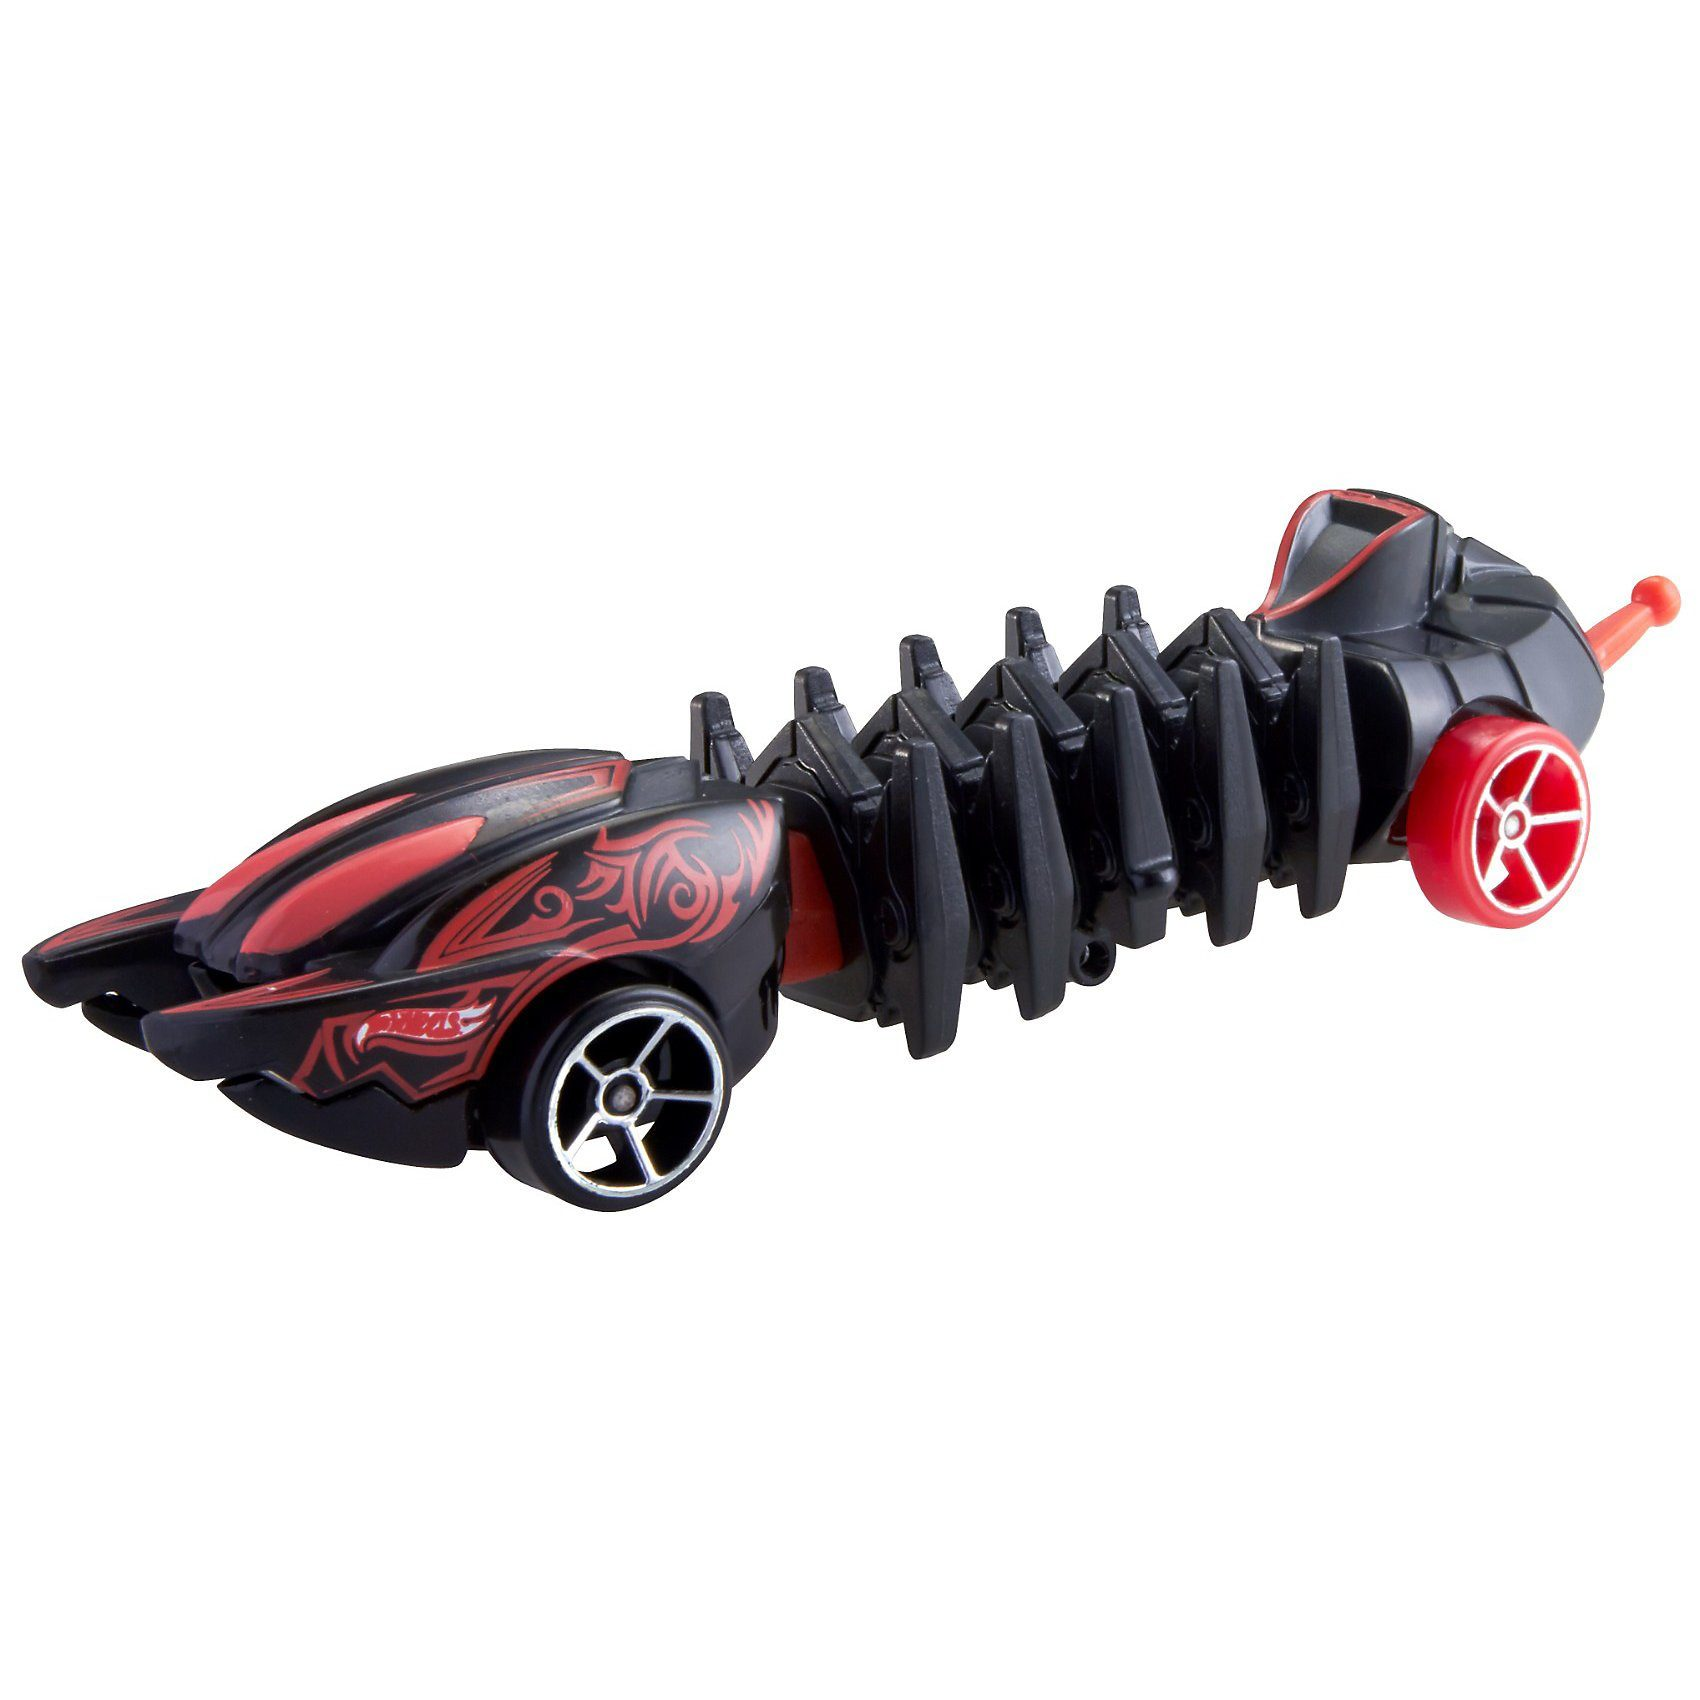 Mattel Hot Wheels Mutant Machines Fahrzeug - 1 Stück, sortiert